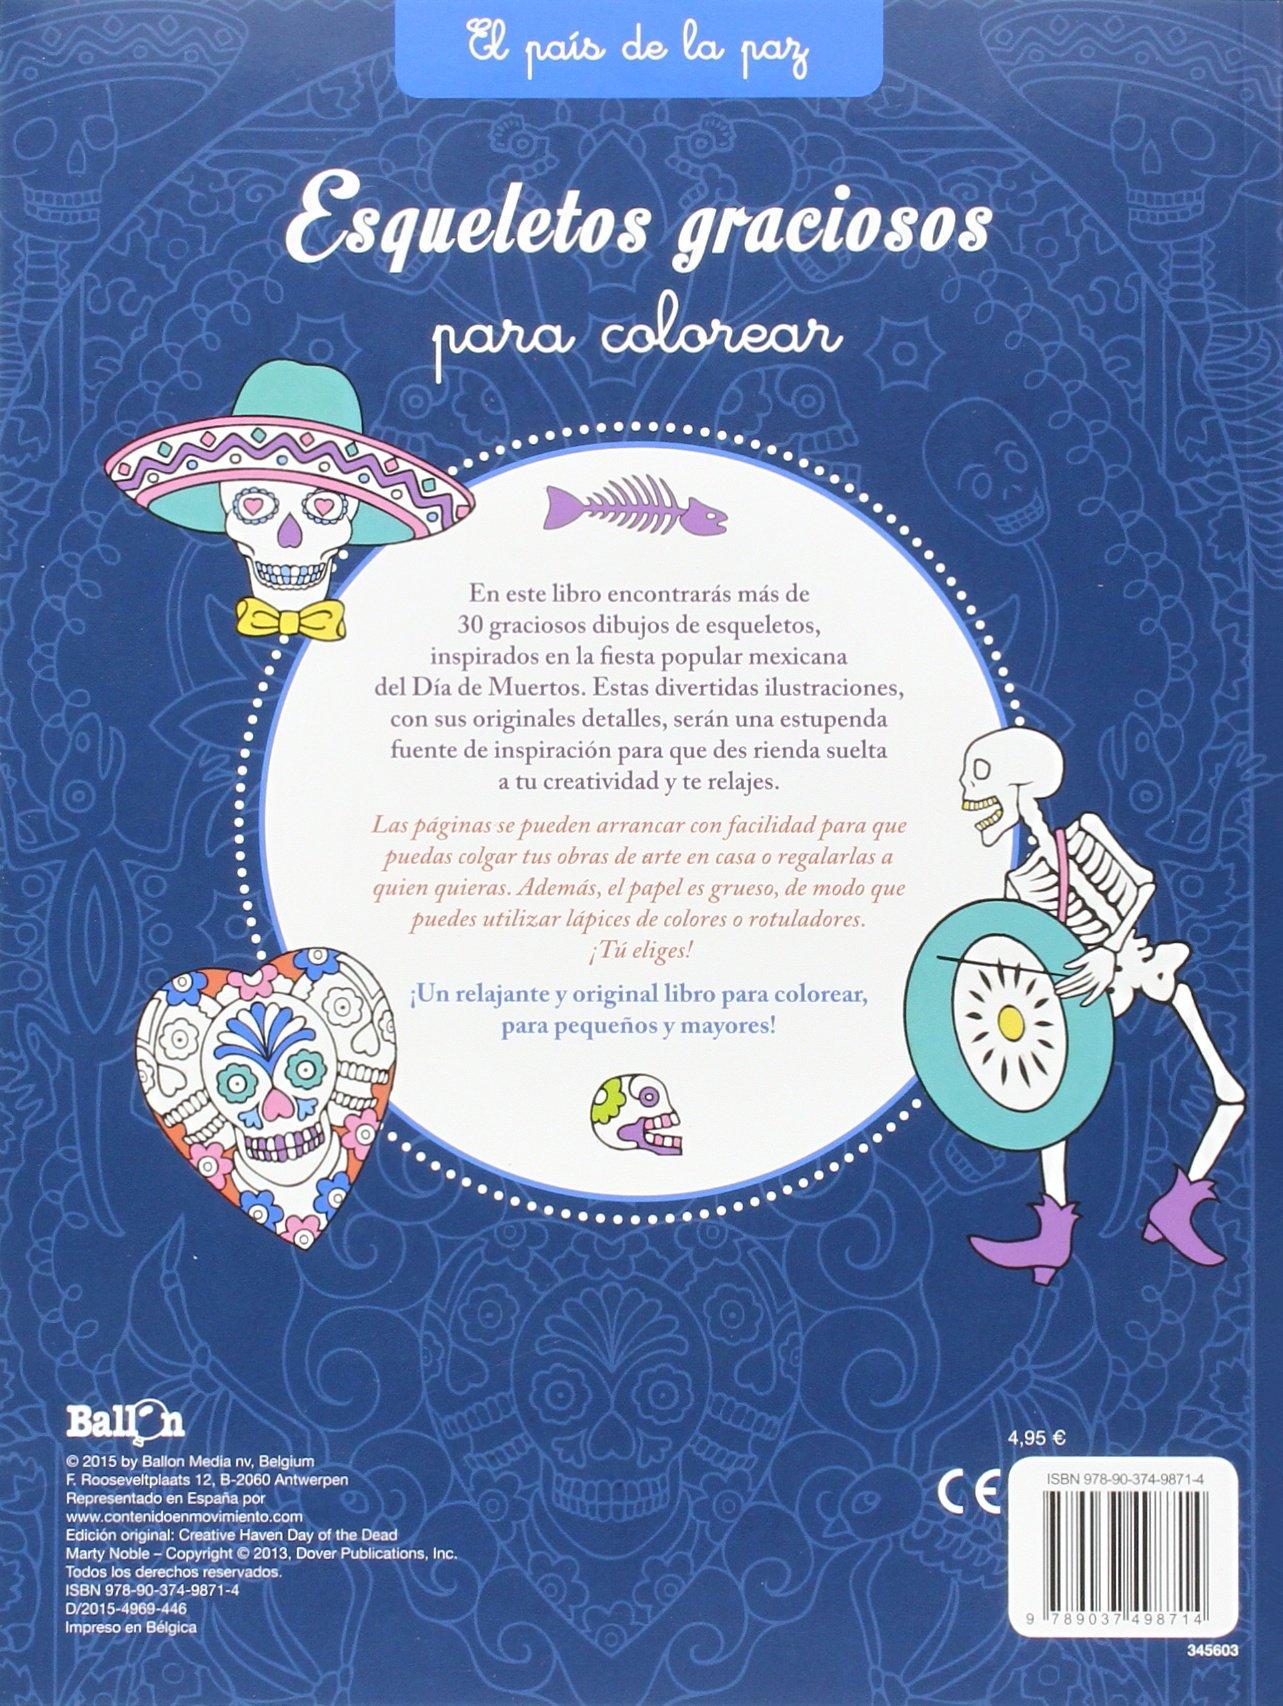 Esqueletos Graciosos. El País De La Paz: Amazon.es: Ballon, Teresa Codina: Libros